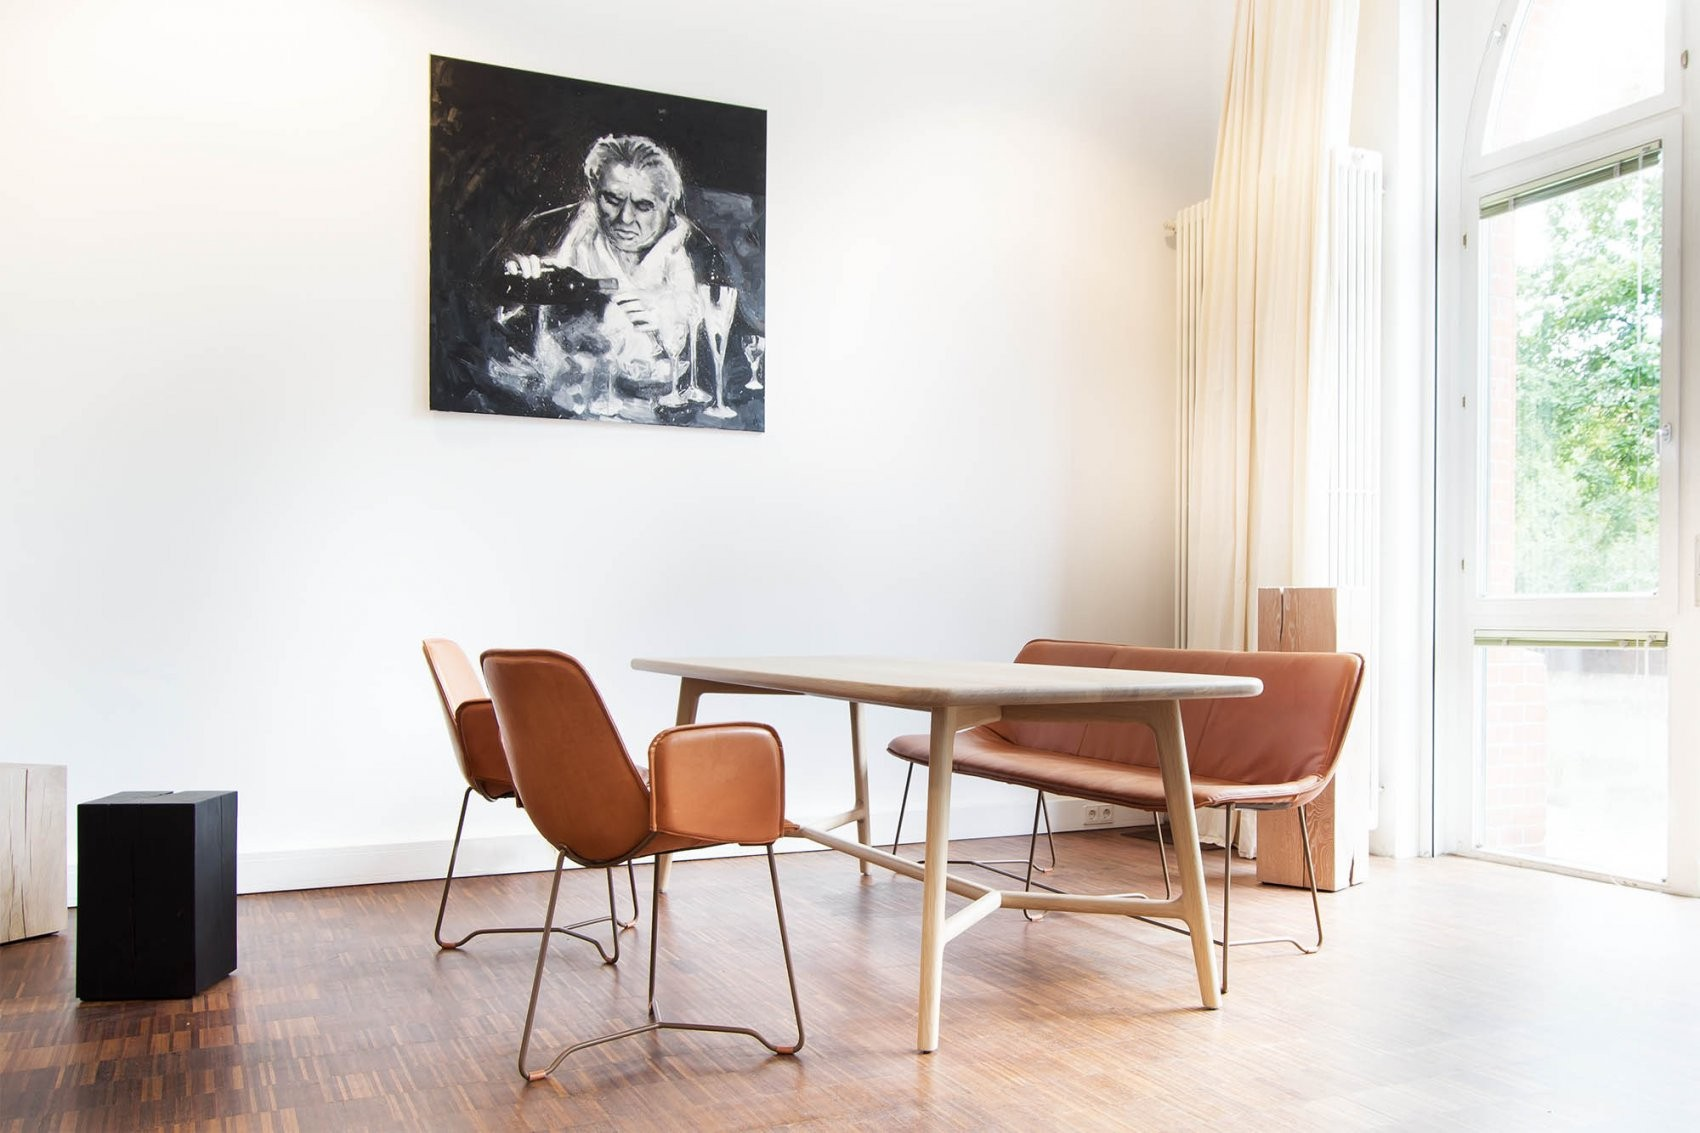 Esstisch Holz Skandinavisch – Kartaginafo Beliebt Konzept Von von Esstisch Stühle Skandinavisch Photo